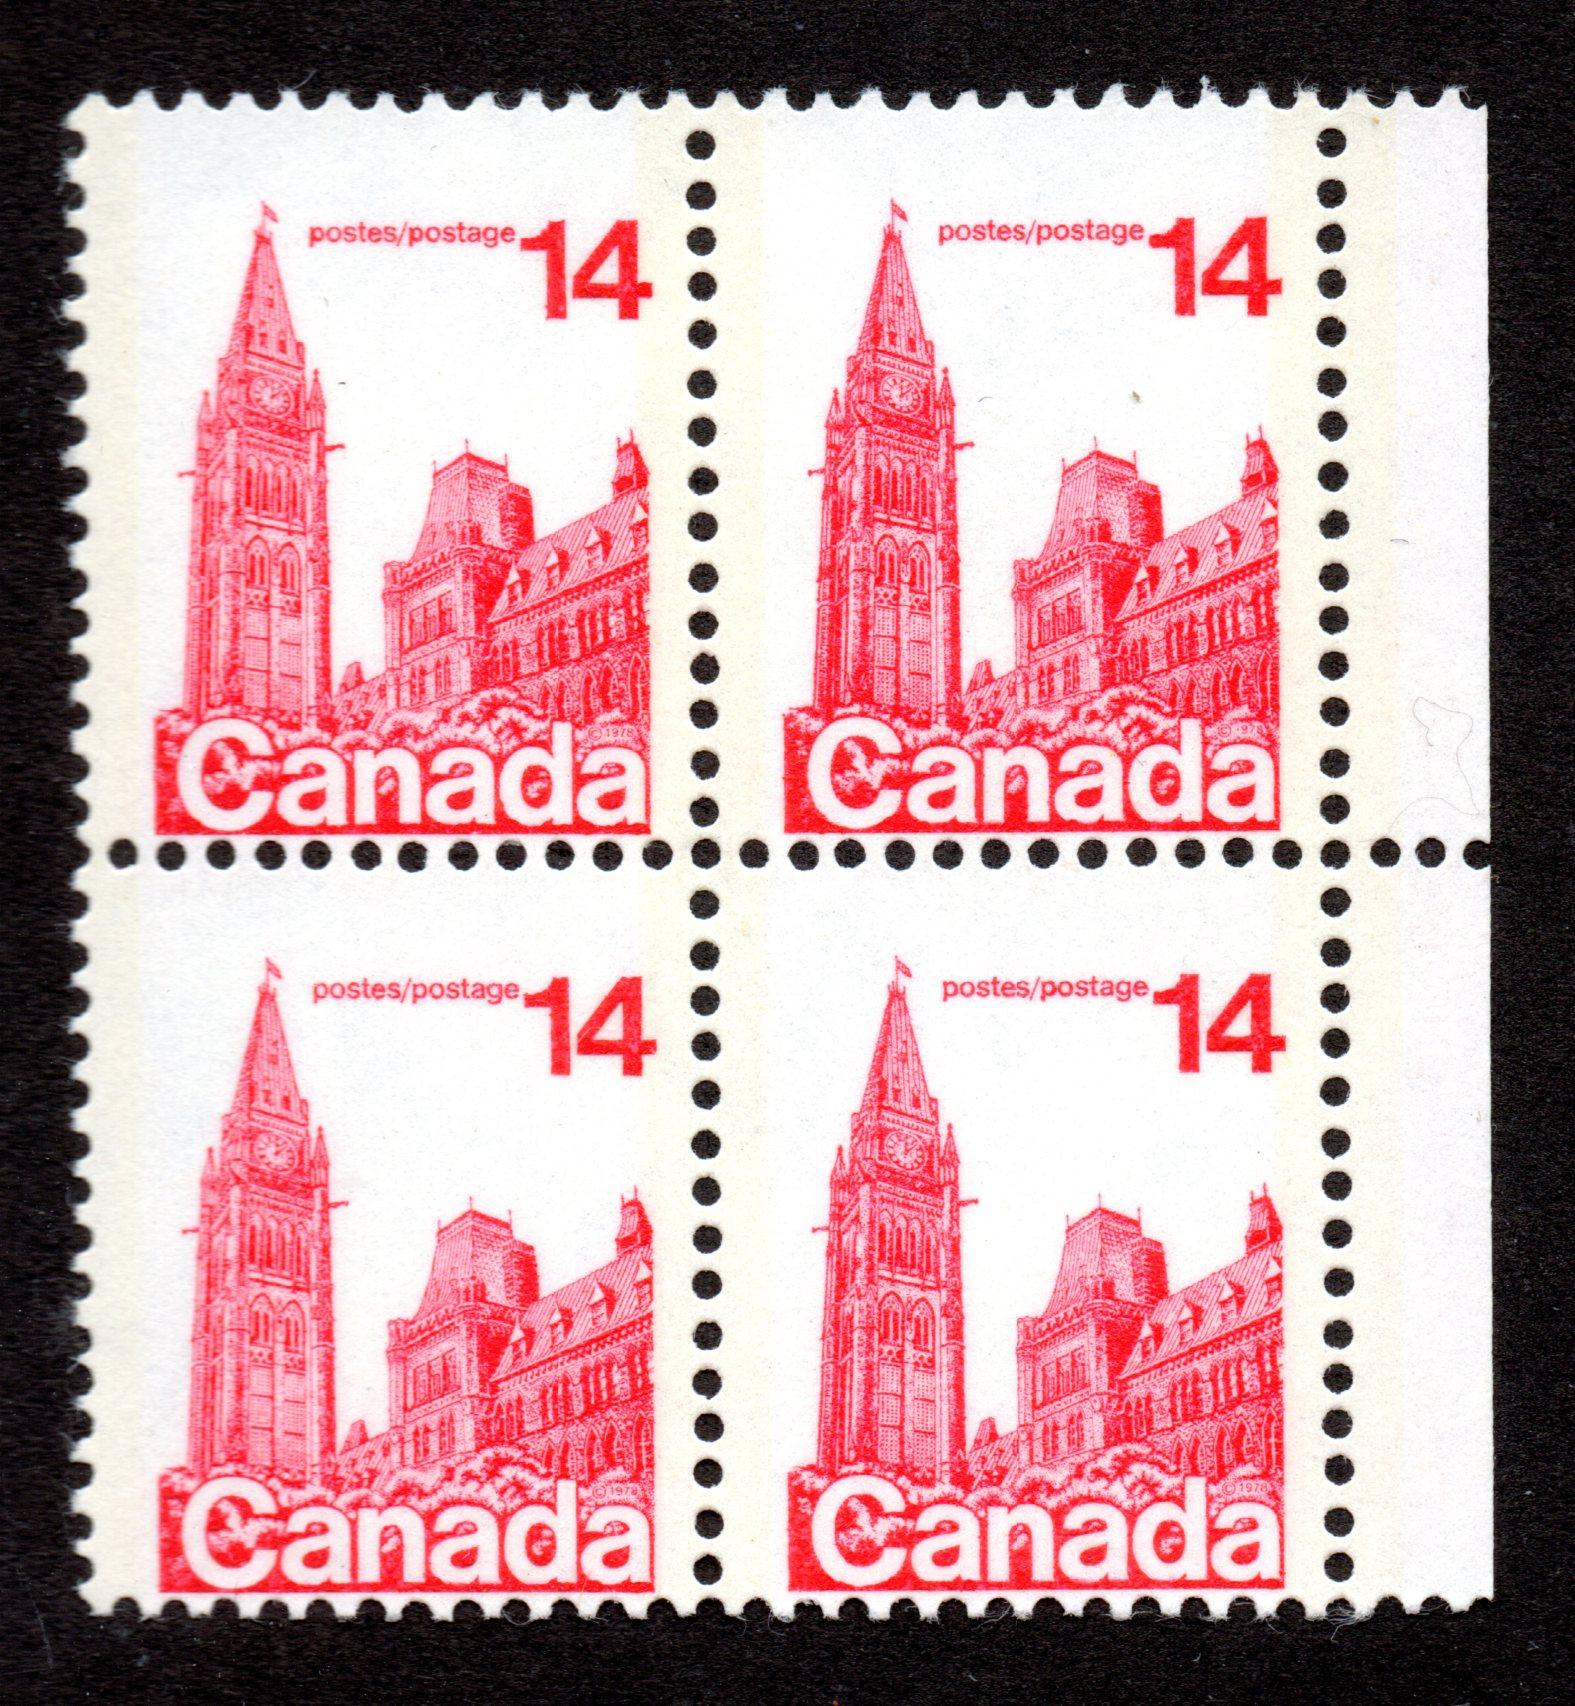 CANADA 1977 14c MARGINAL BLOCK OF FOUR PRINTED ON GUMMED SIDE